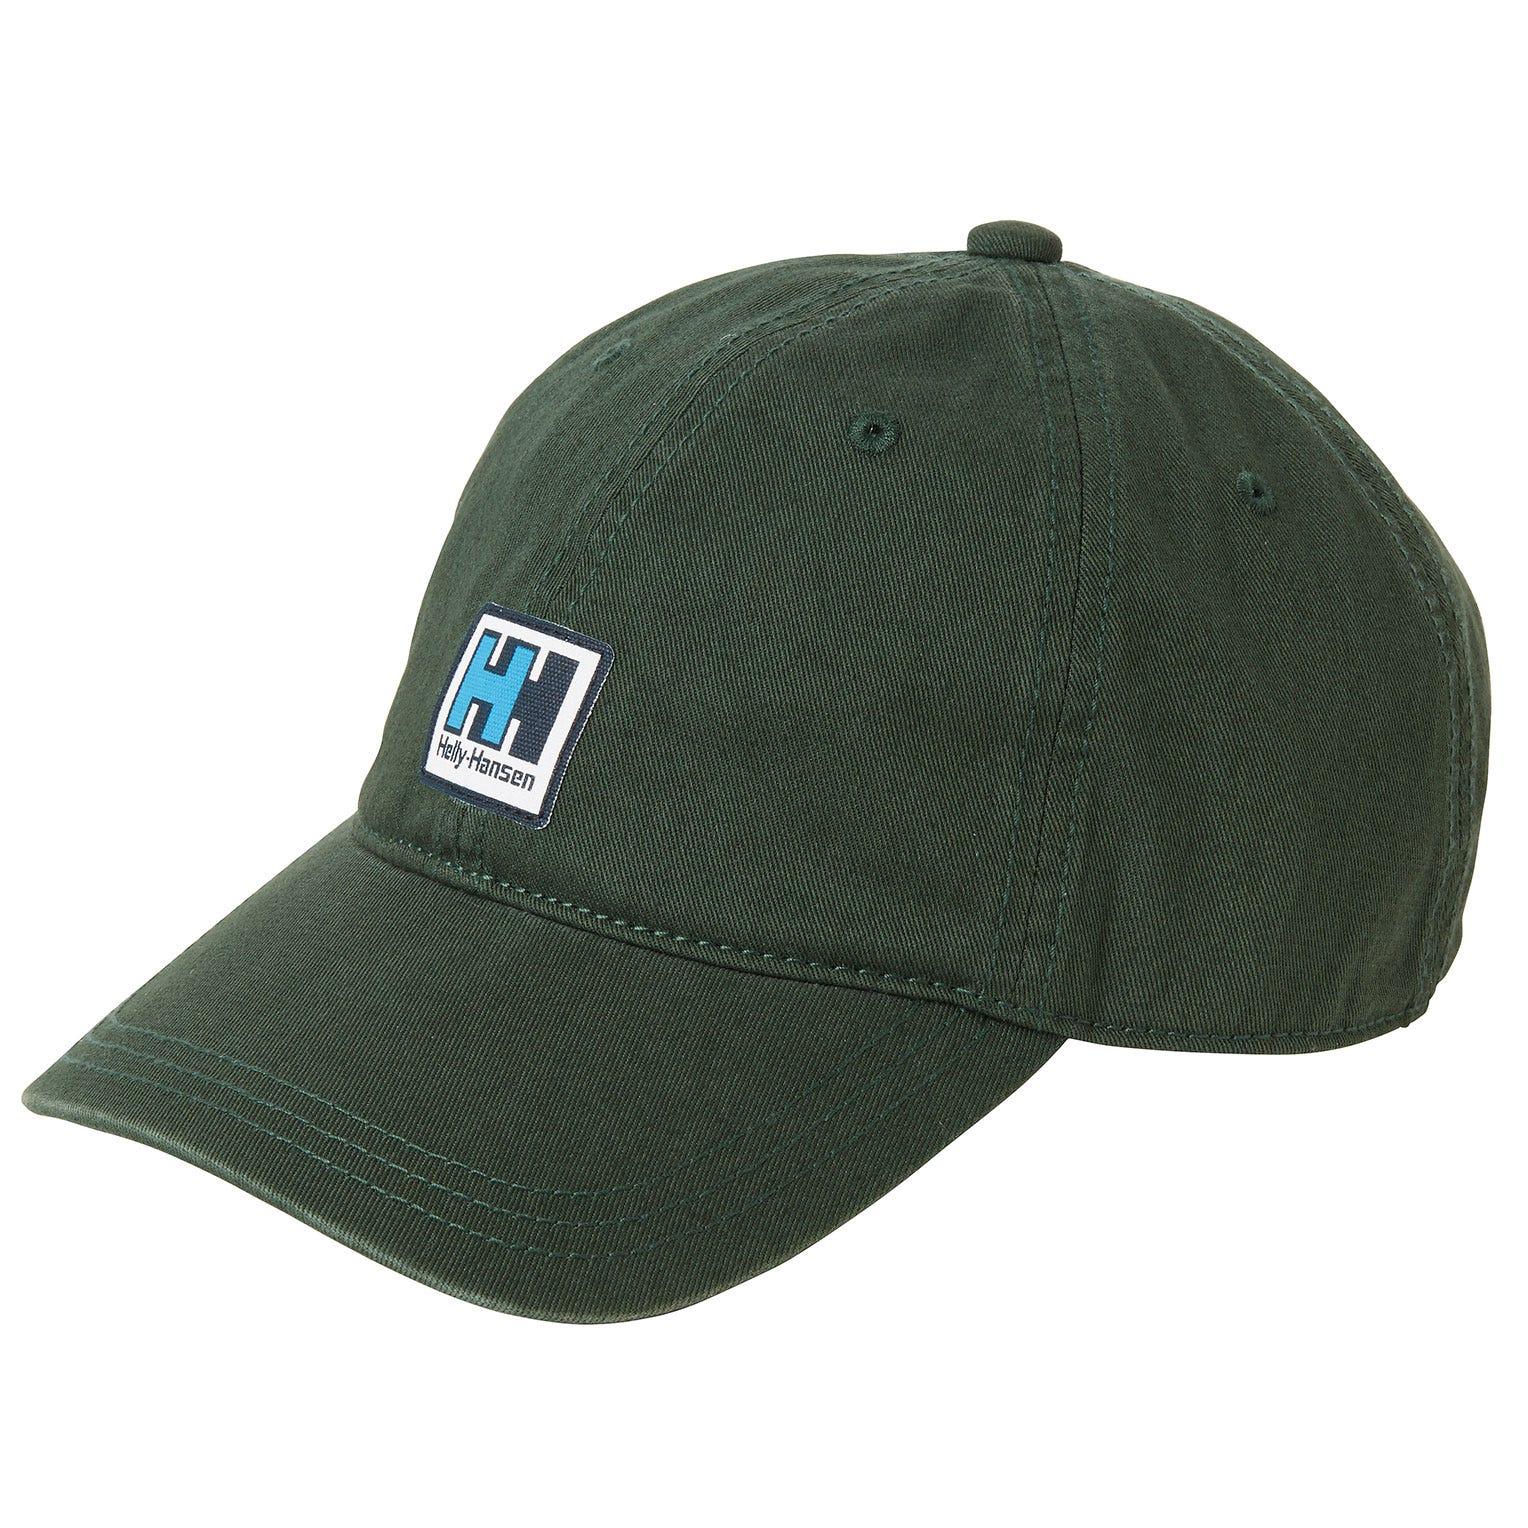 d04e33a5fac0c HH LOGO CAP